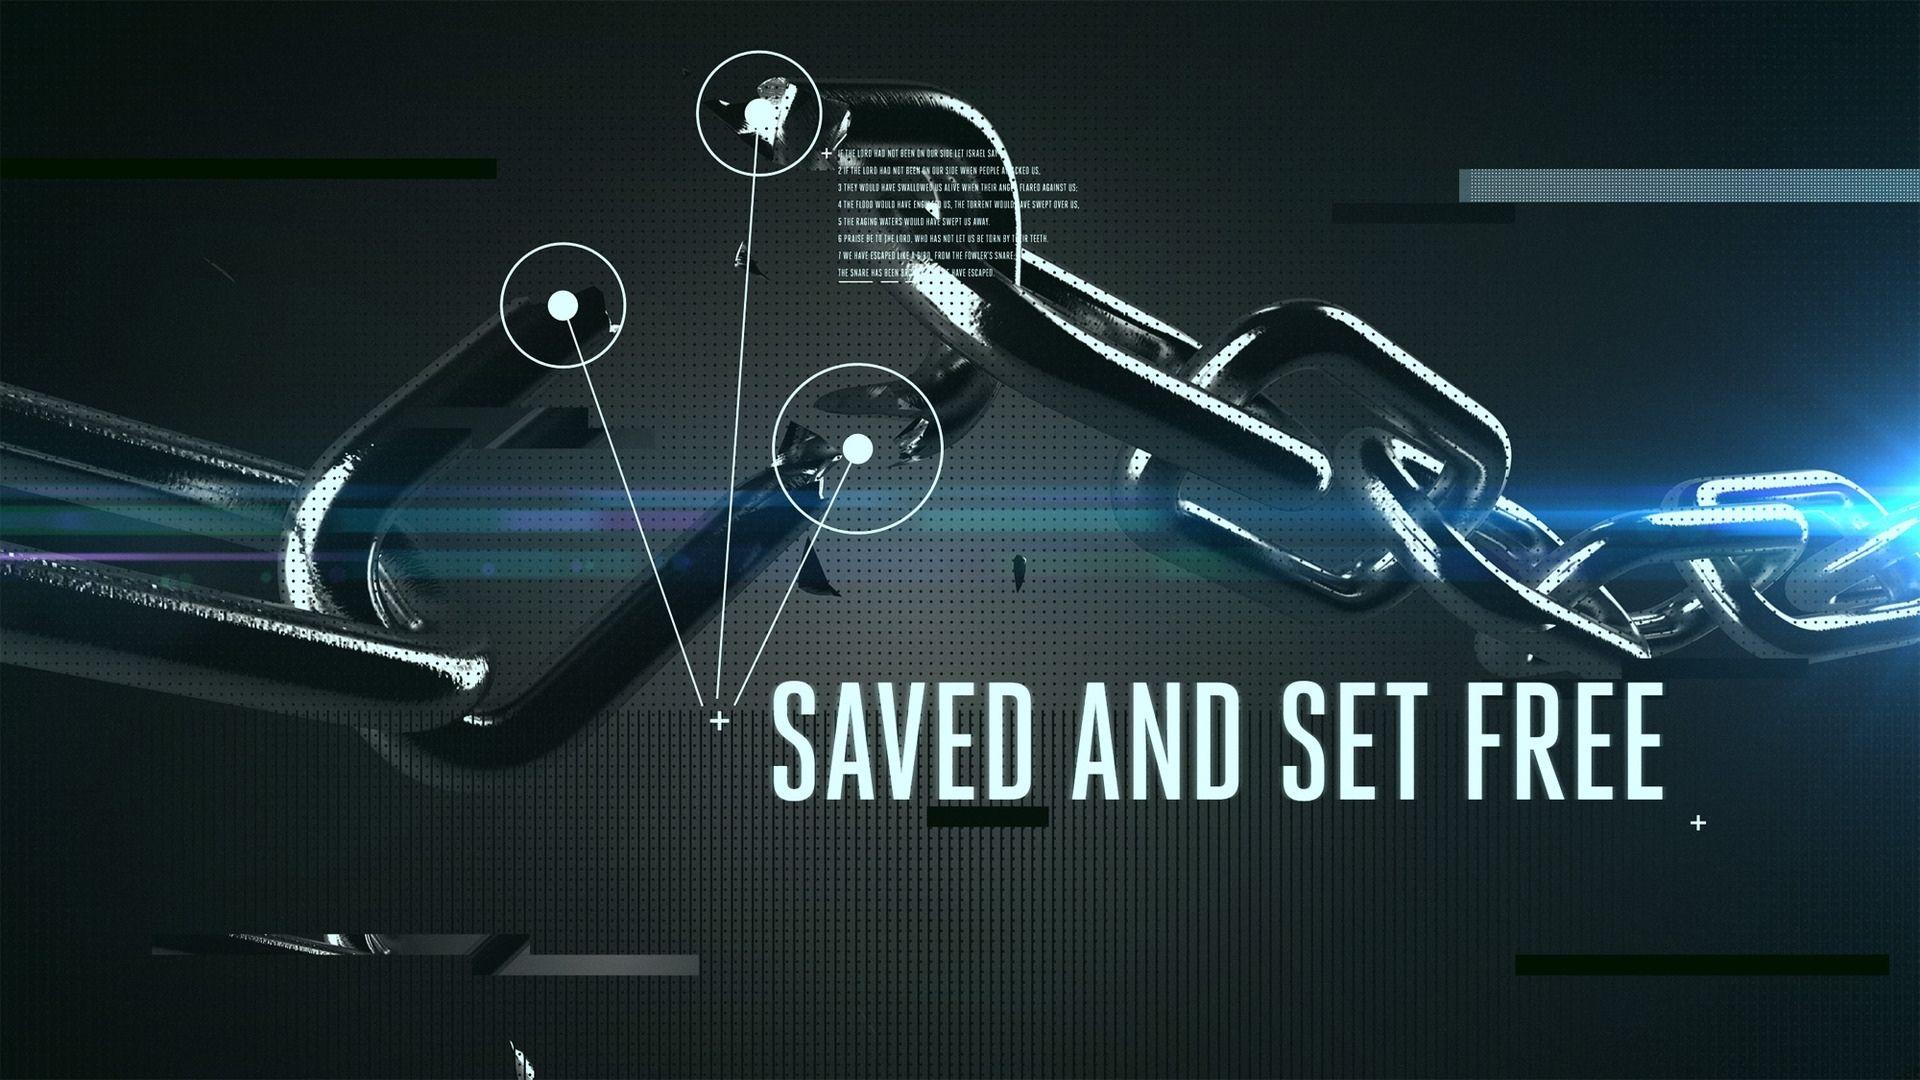 Saved and Set Free